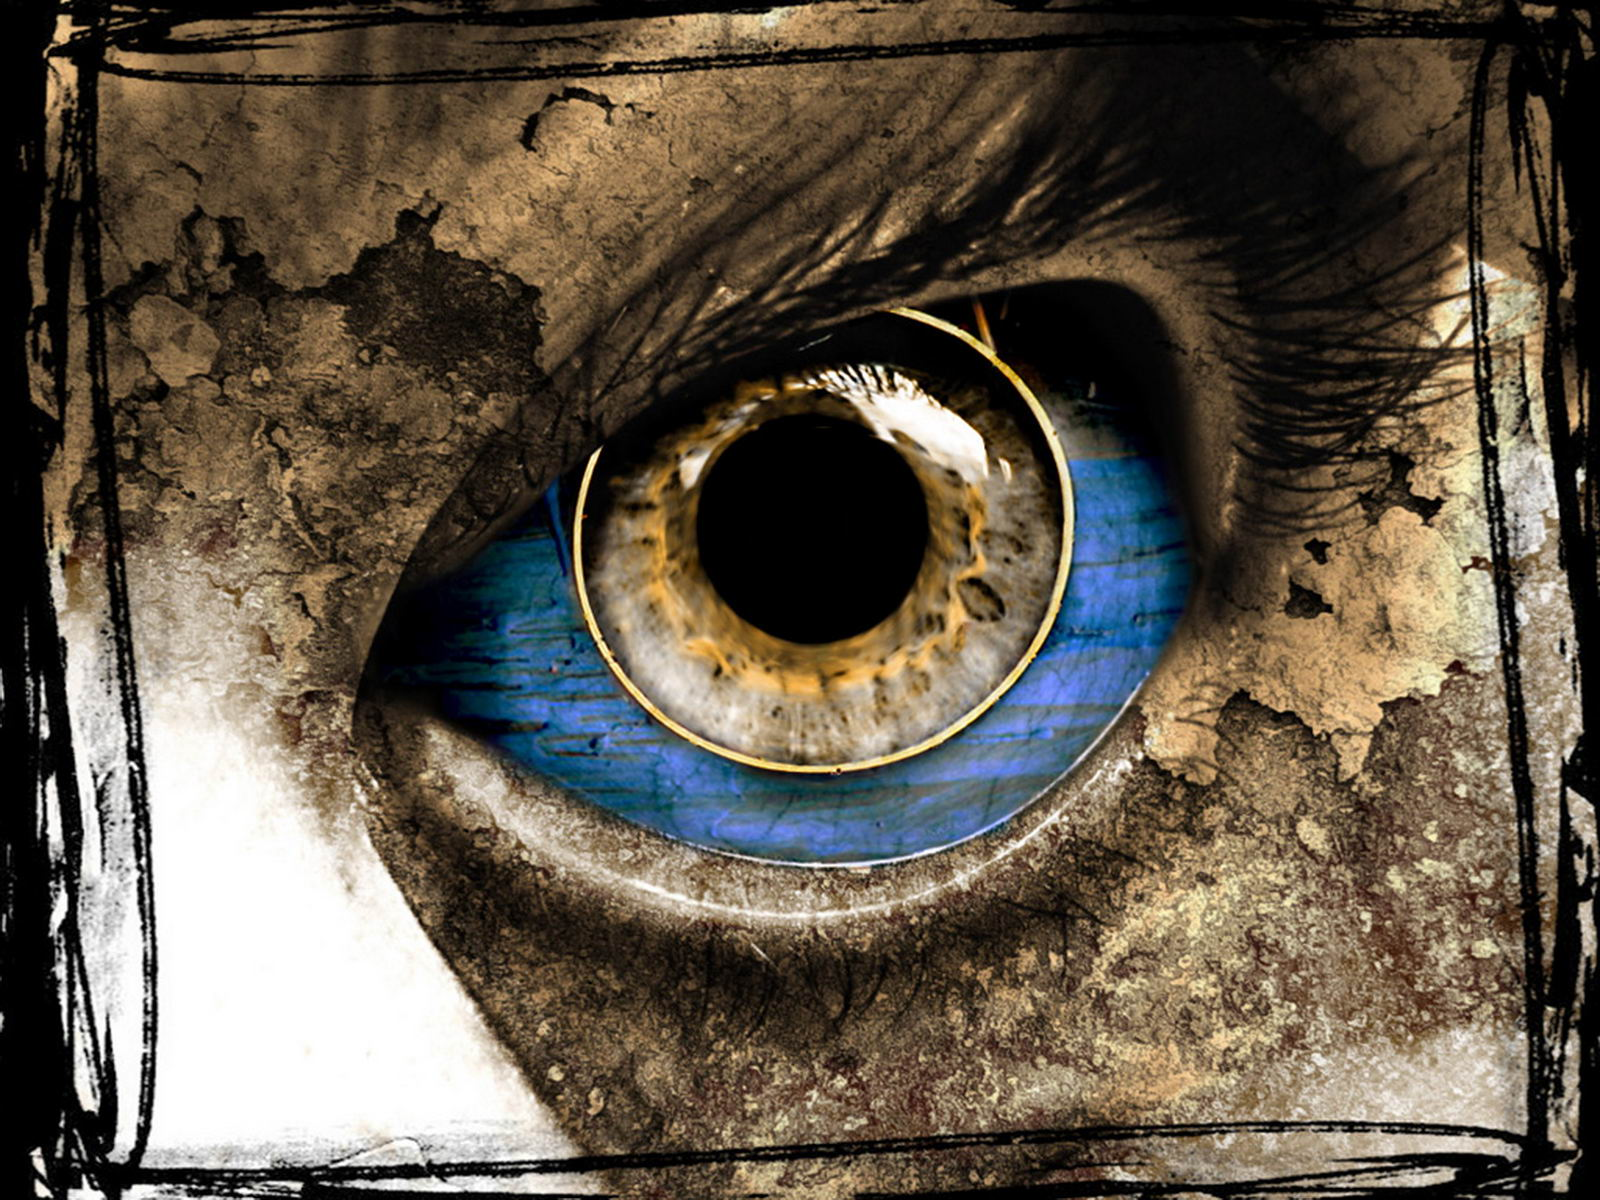 http://3.bp.blogspot.com/-hbcsOGSmj50/UHU2oao9EtI/AAAAAAAAAbo/xTxNCDc9DaY/s1600/Eye+Horror+Desktop+Wallpapers.jpg